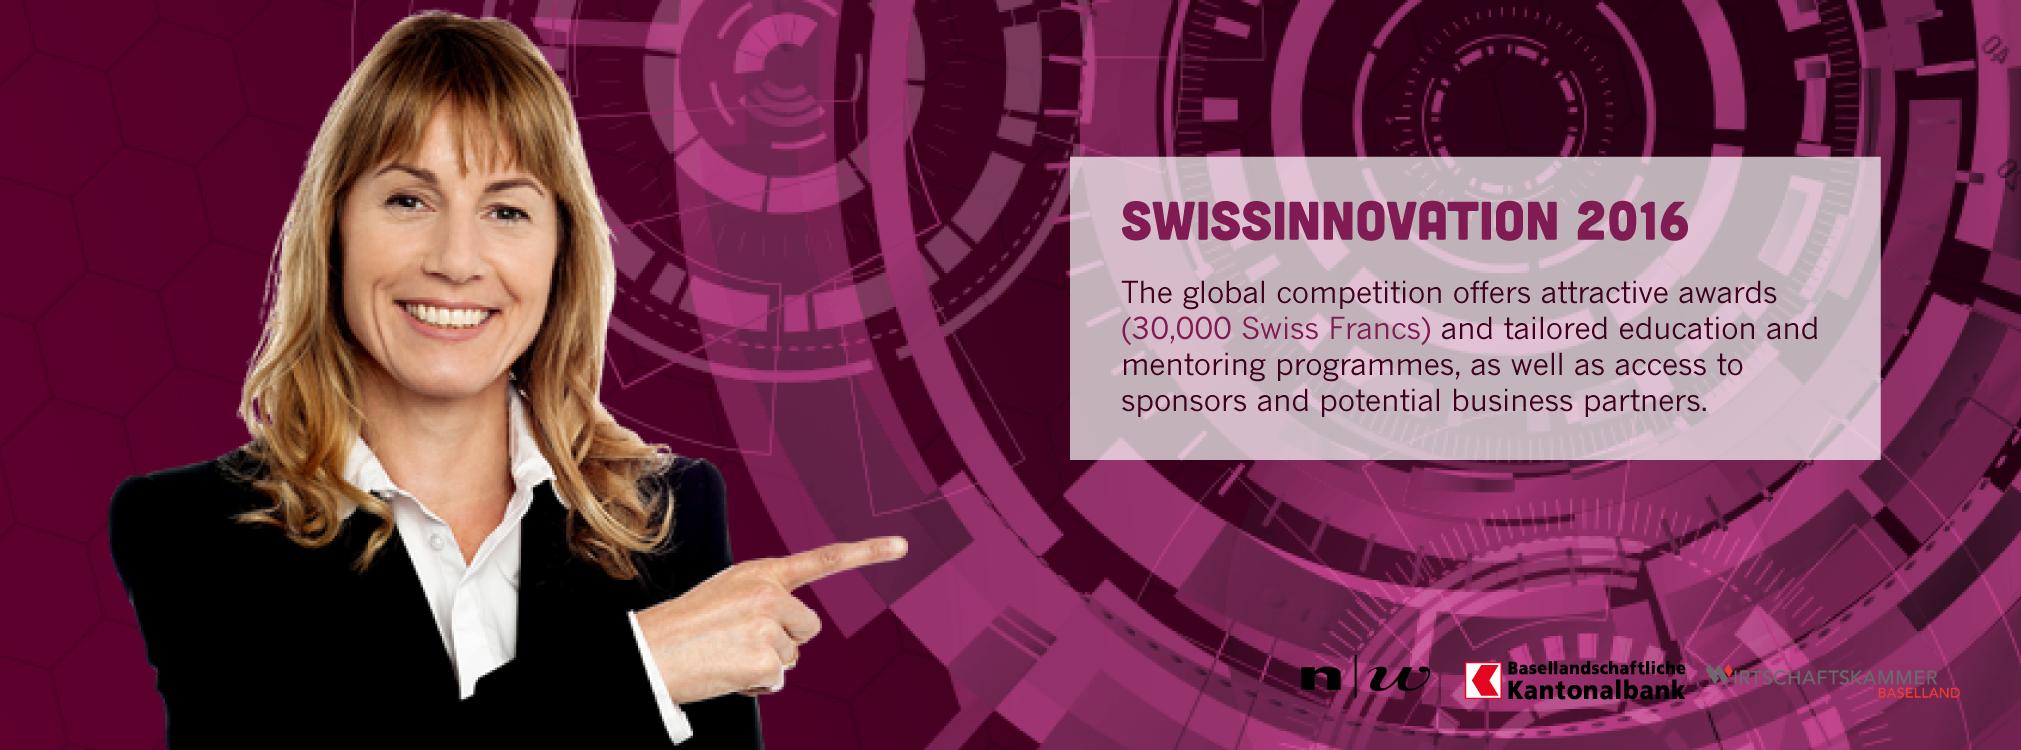 SwissInnovation 2016 banner web-trang trong